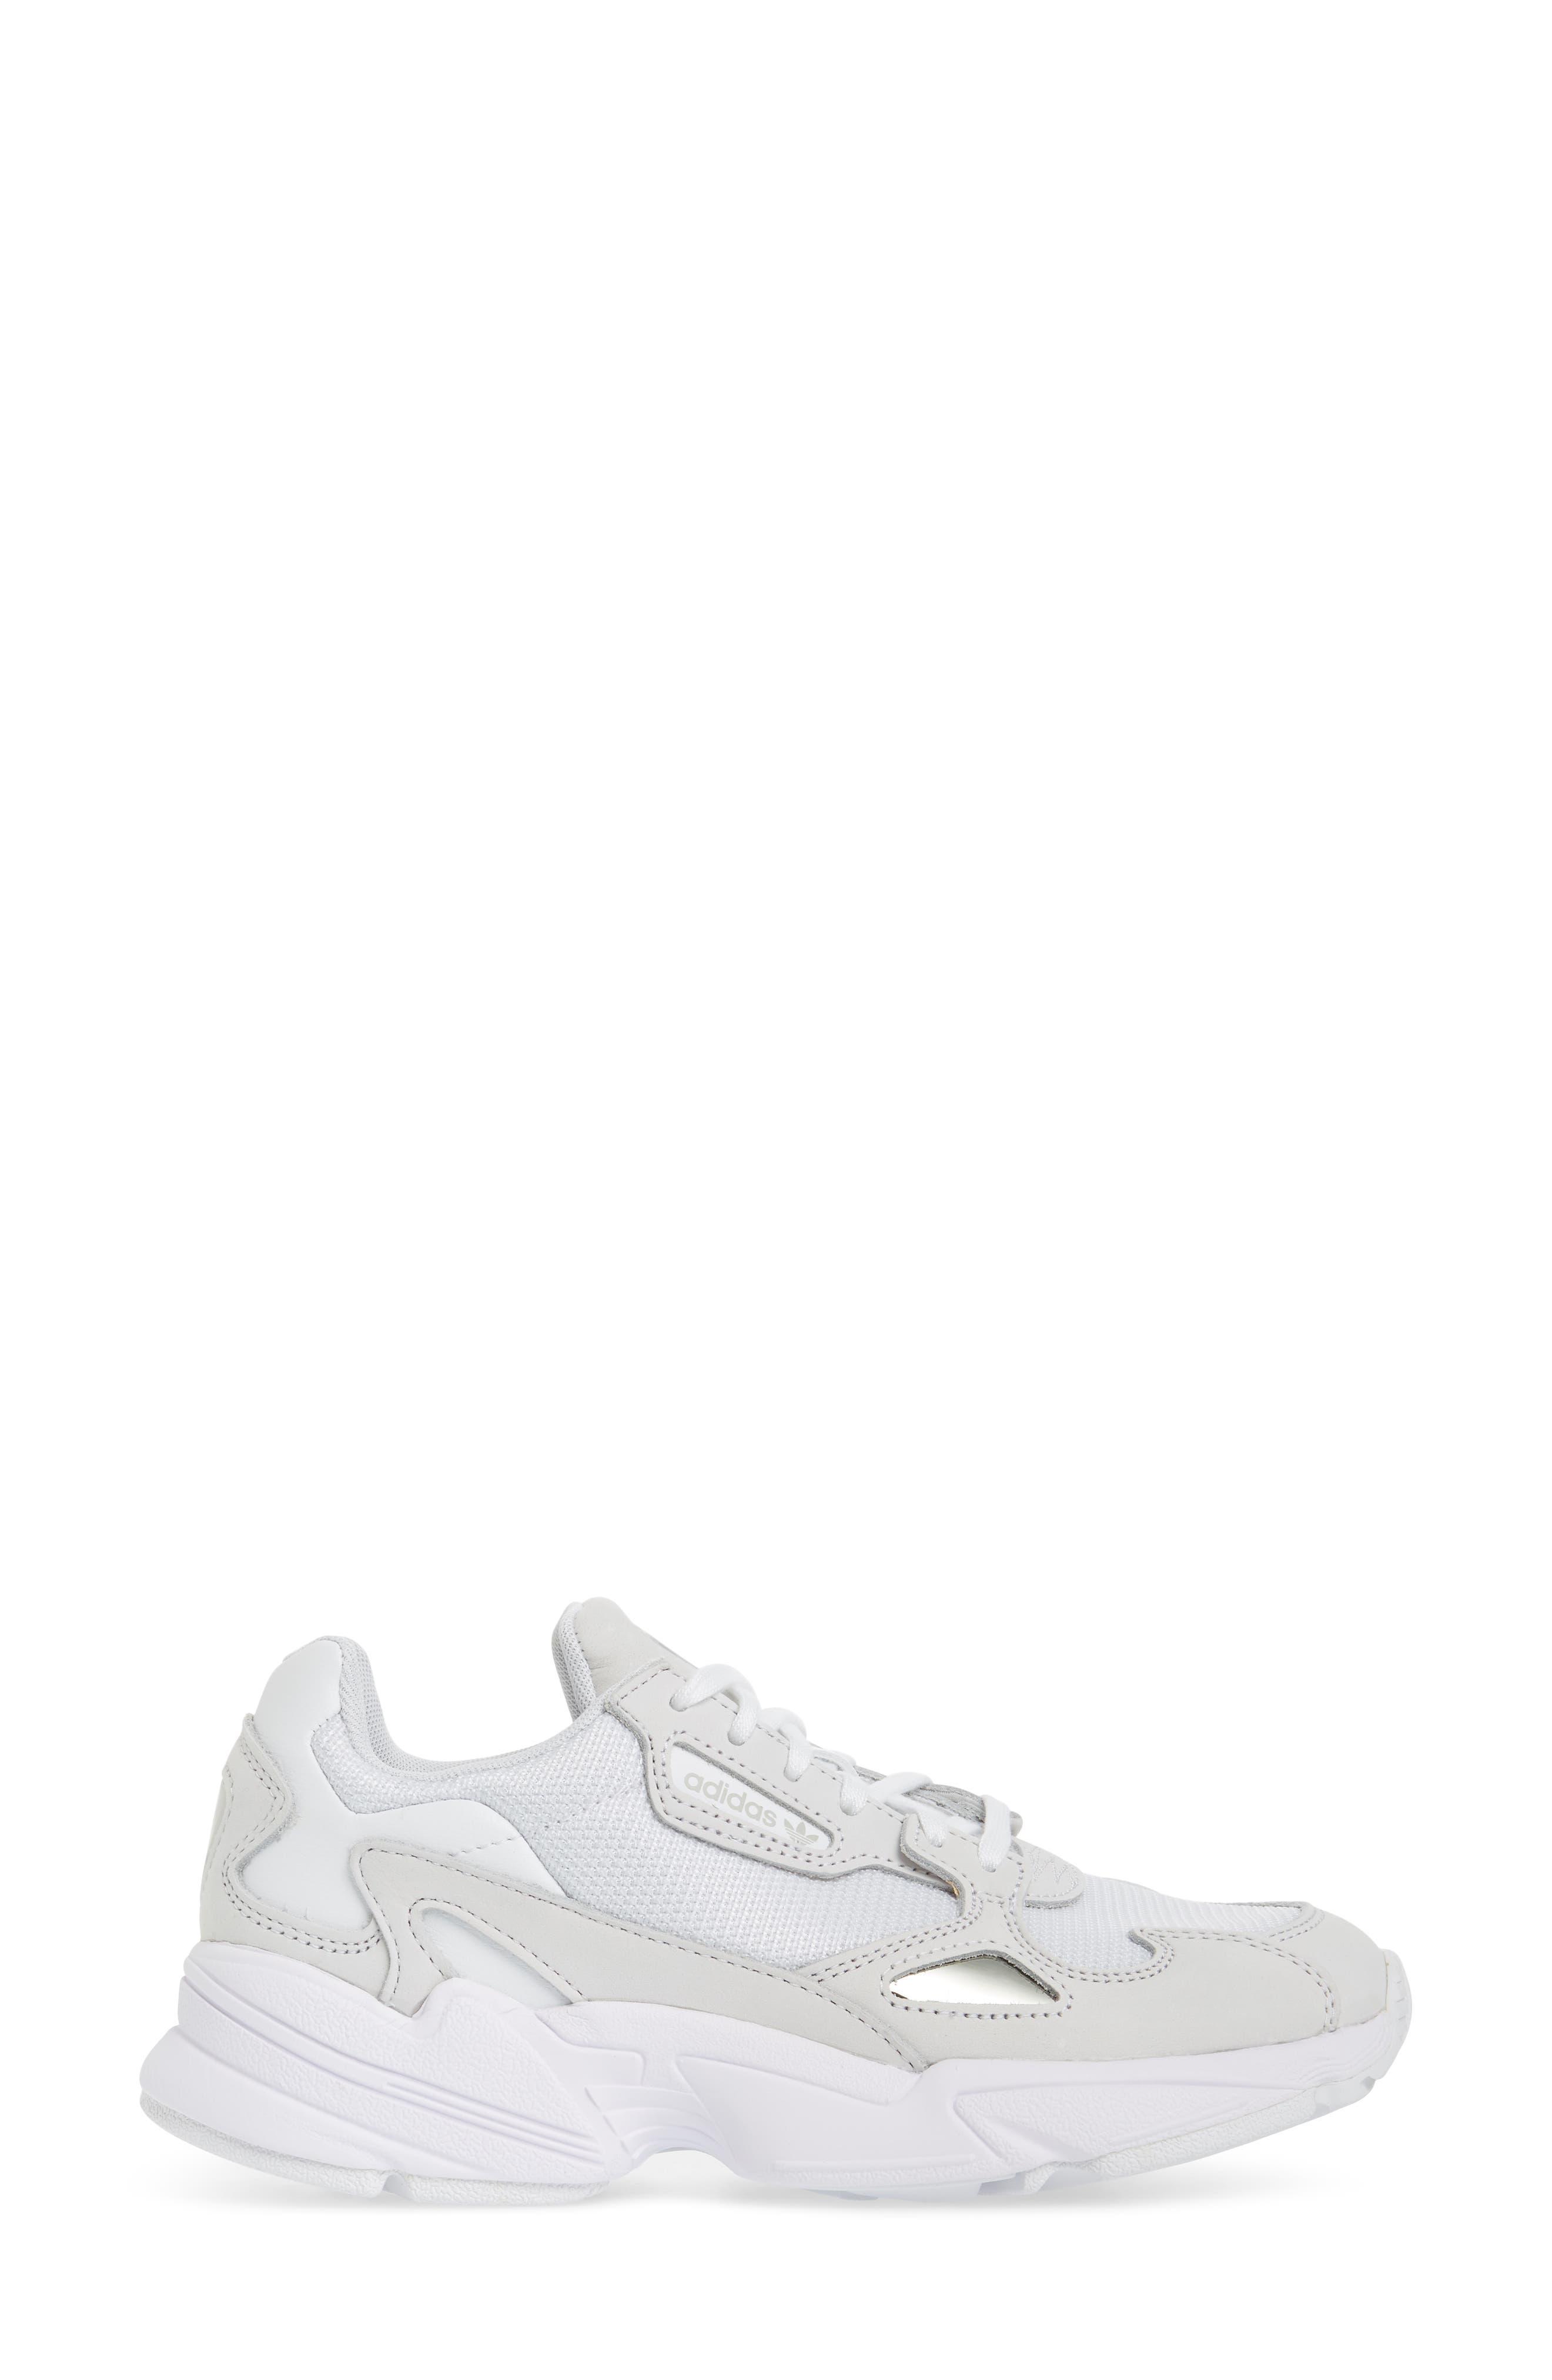 Falcon Sneaker,                             Alternate thumbnail 3, color,                             WHITE